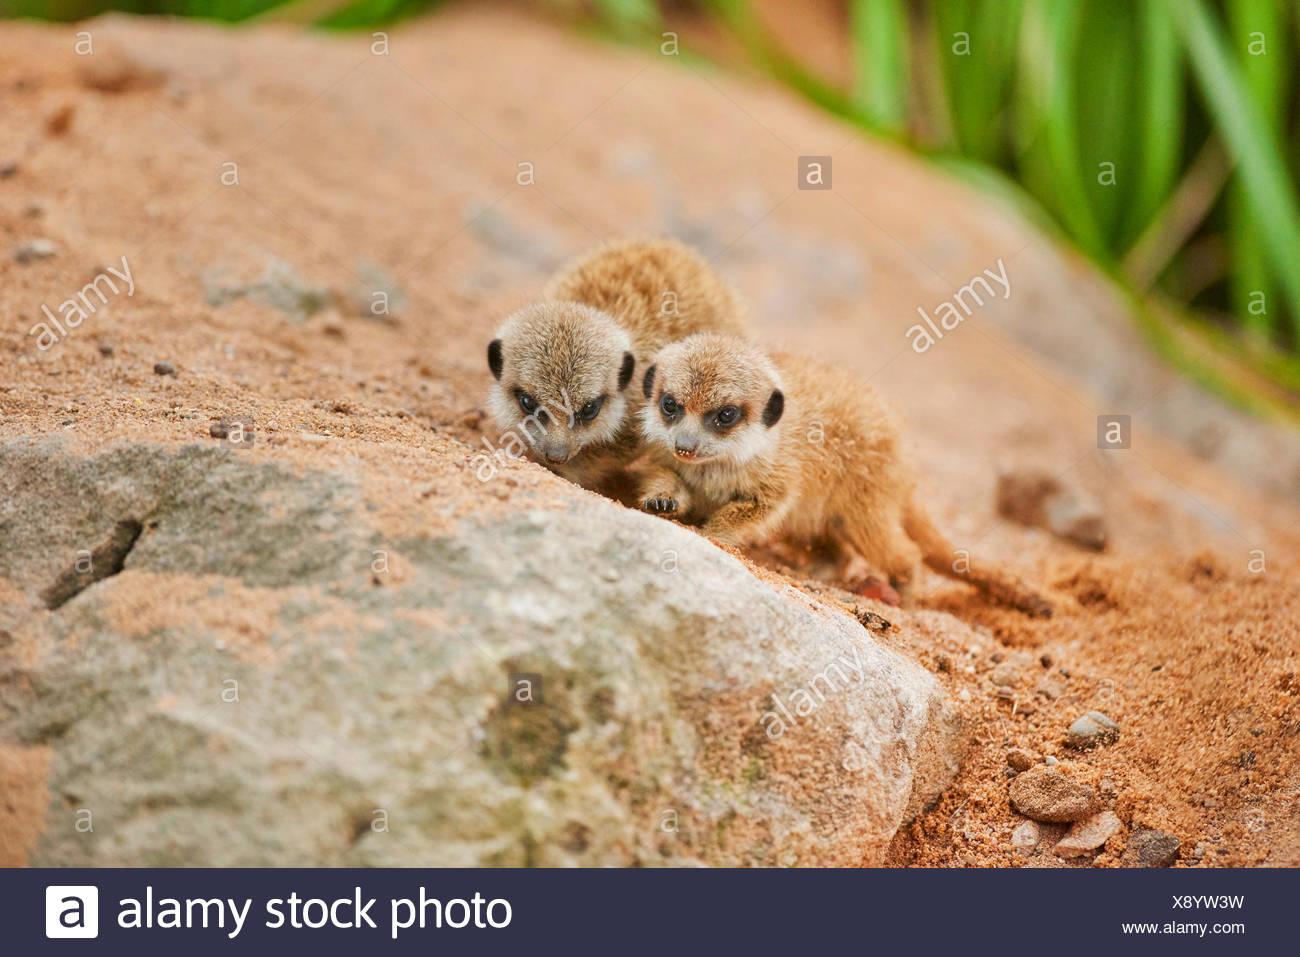 suricate, slender-tailed meerkat (Suricata suricatta), two youngsters - Stock Image